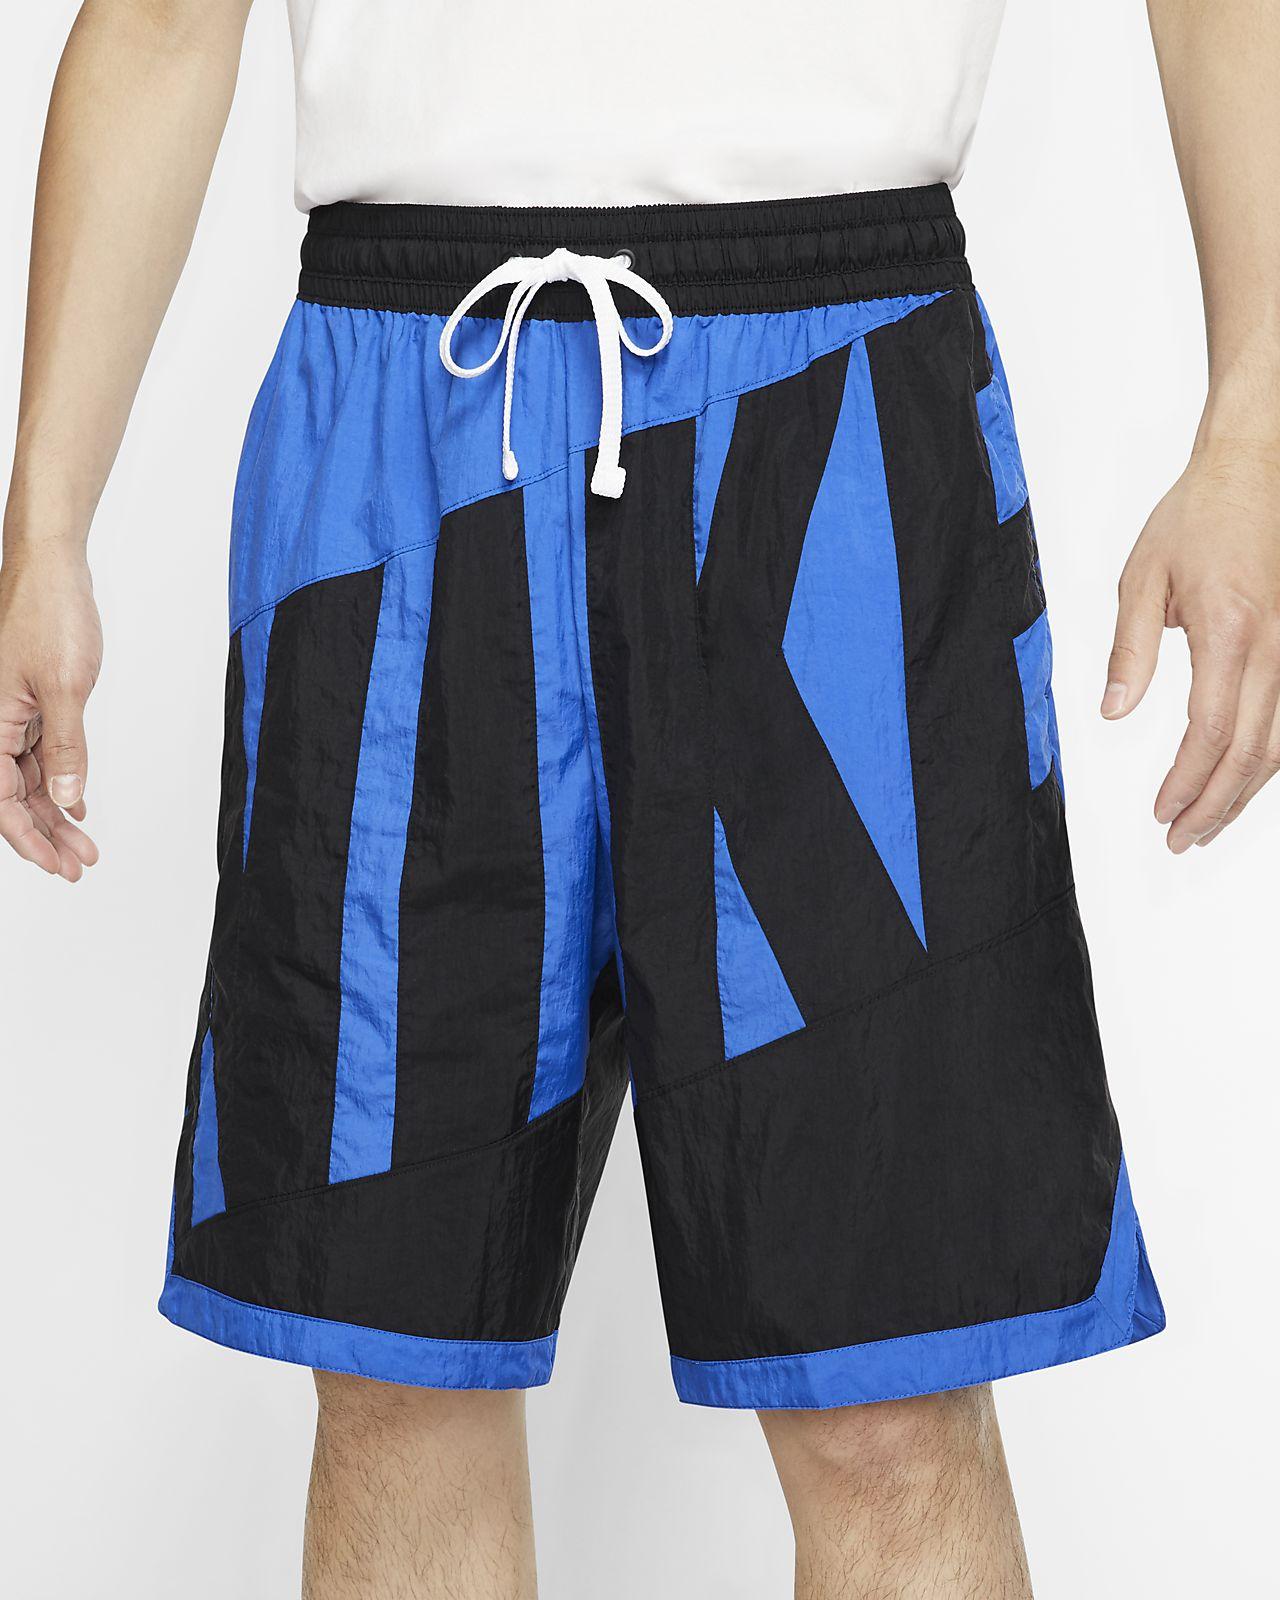 Dri Throwback Fit Basketball Short De Nike OXlukZwPiT